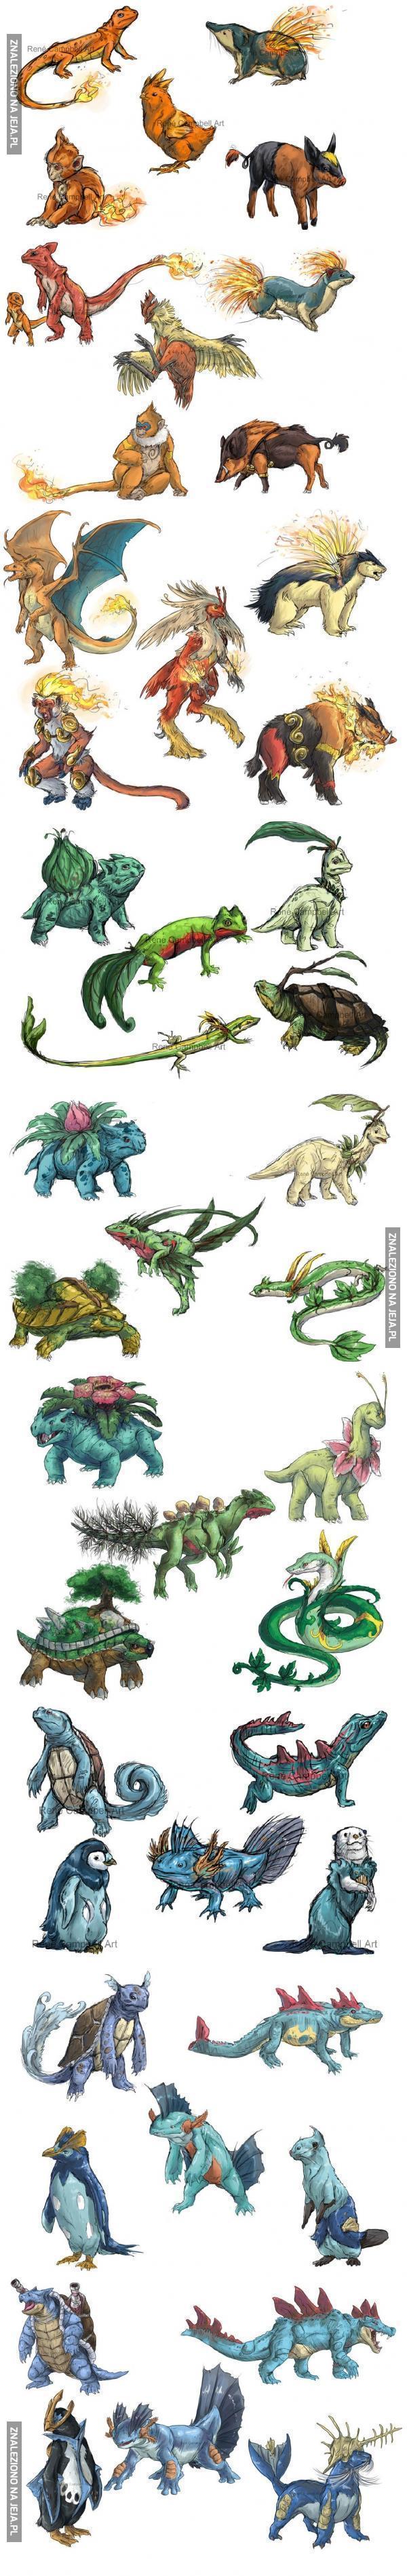 Pokemony według Rene Campbella